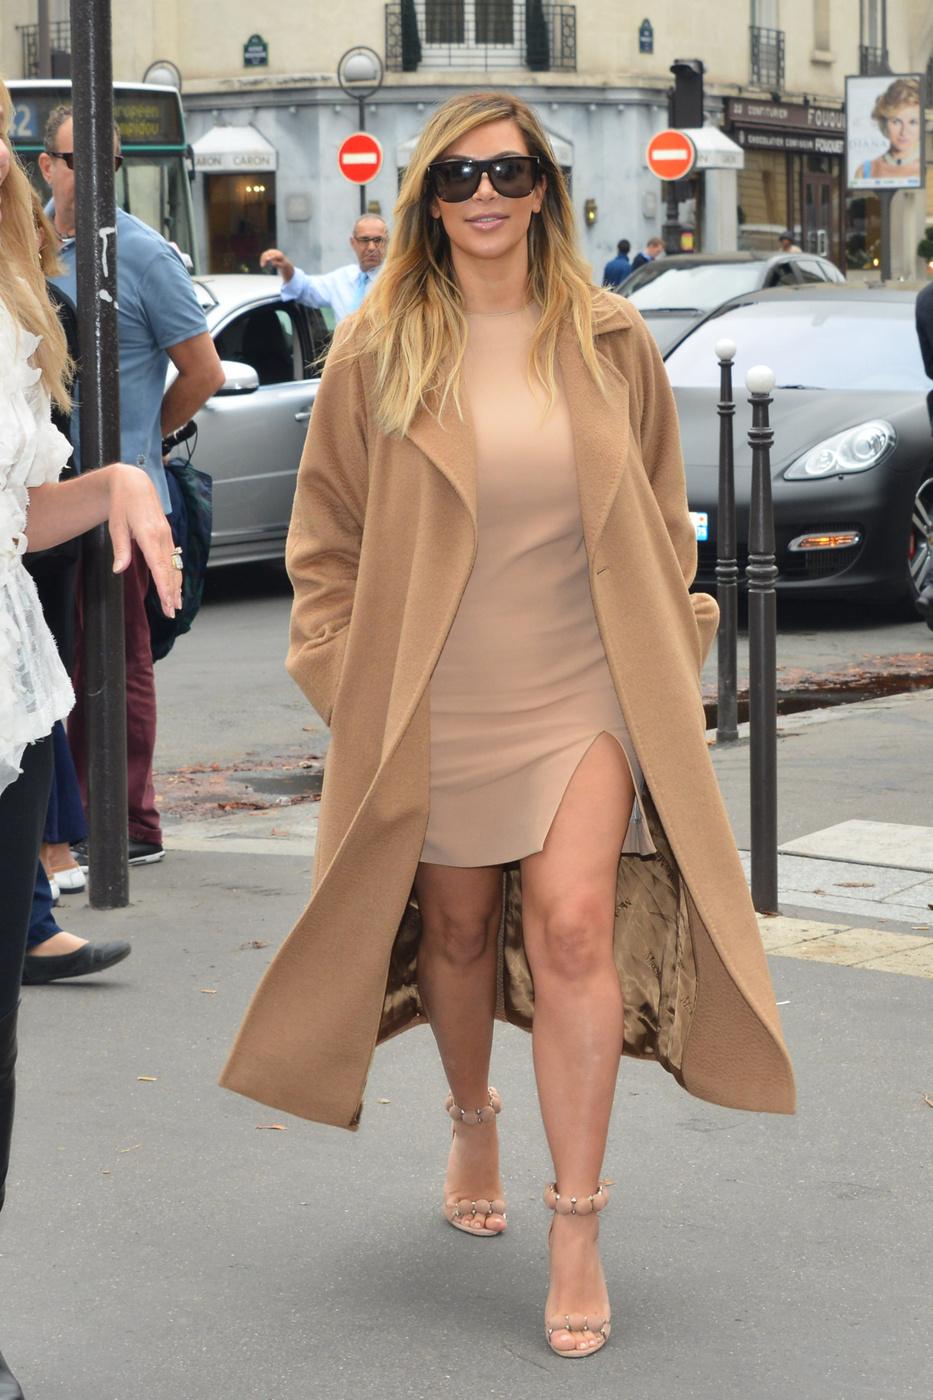 kim kardashian weight loss sexy outfit